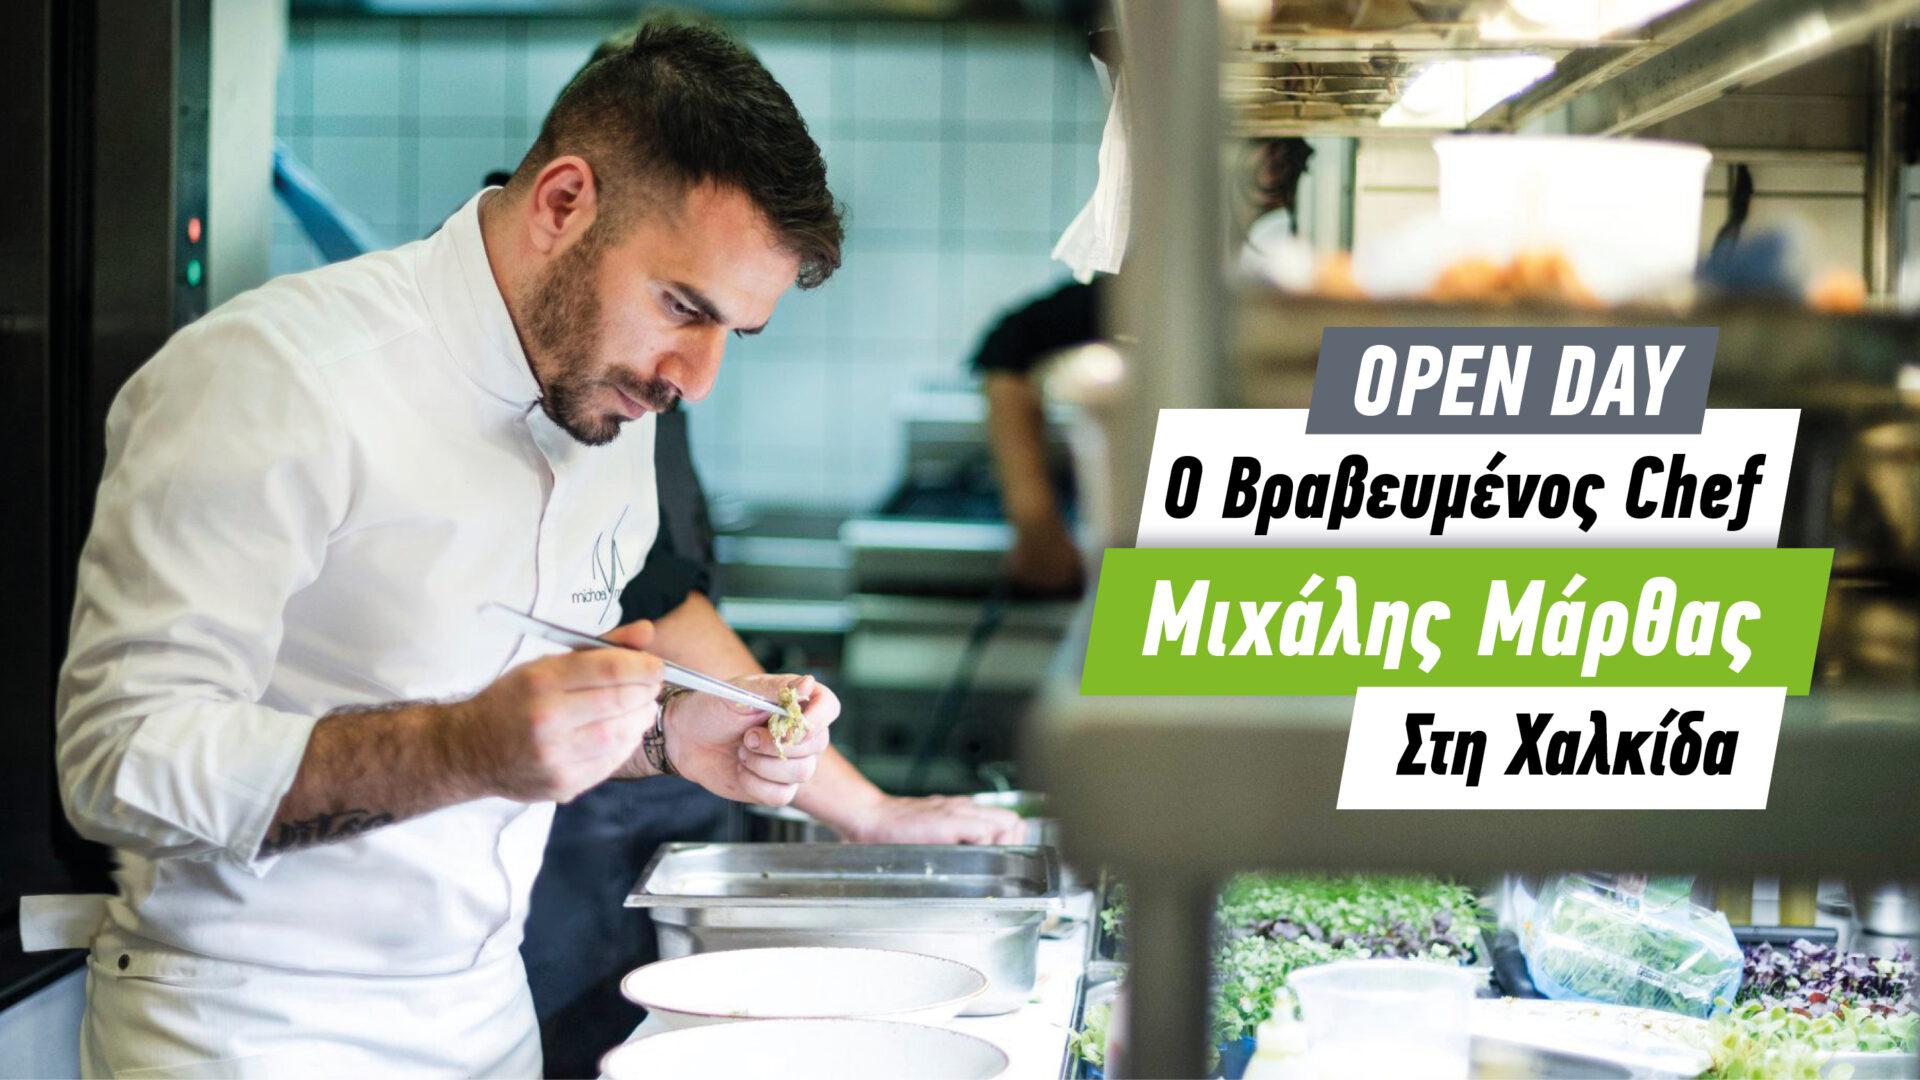 Open Day Μαγειρικής – O Βραβευμένος Chef Μιχάλης Μάρθας Στη Χαλκίδα